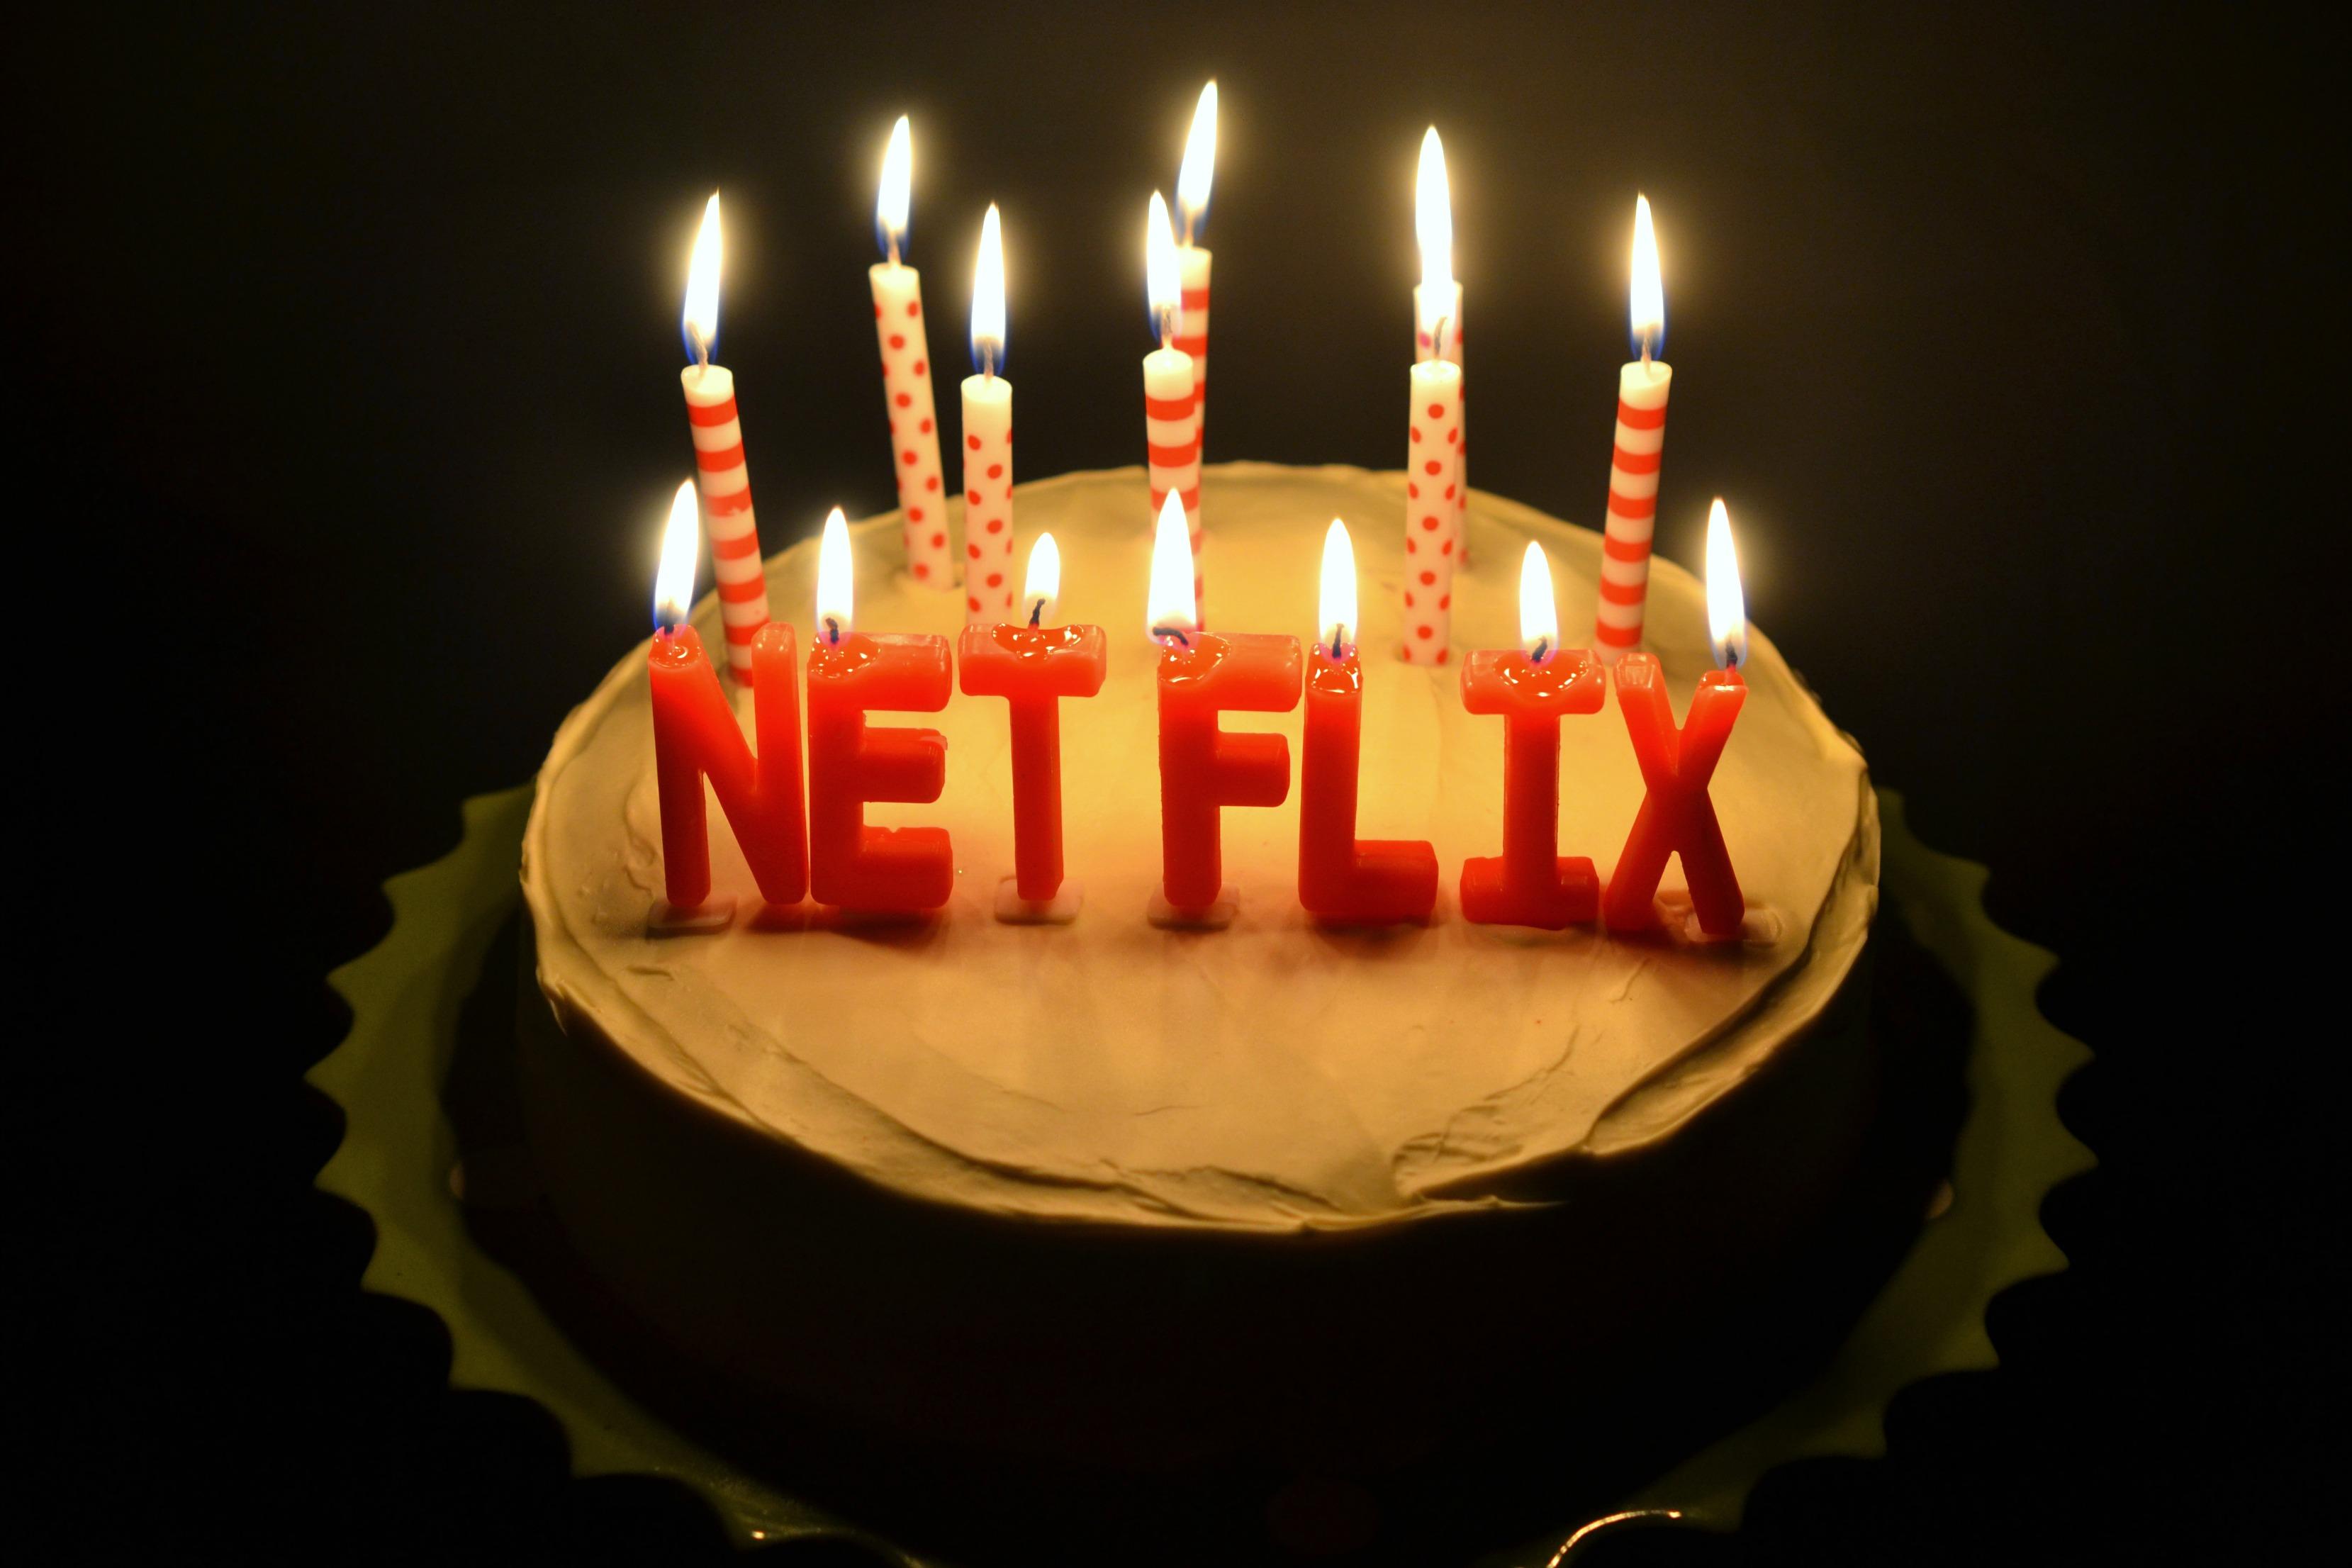 Celebrate Birthdays With Cake And Netflix Jolly Tomato